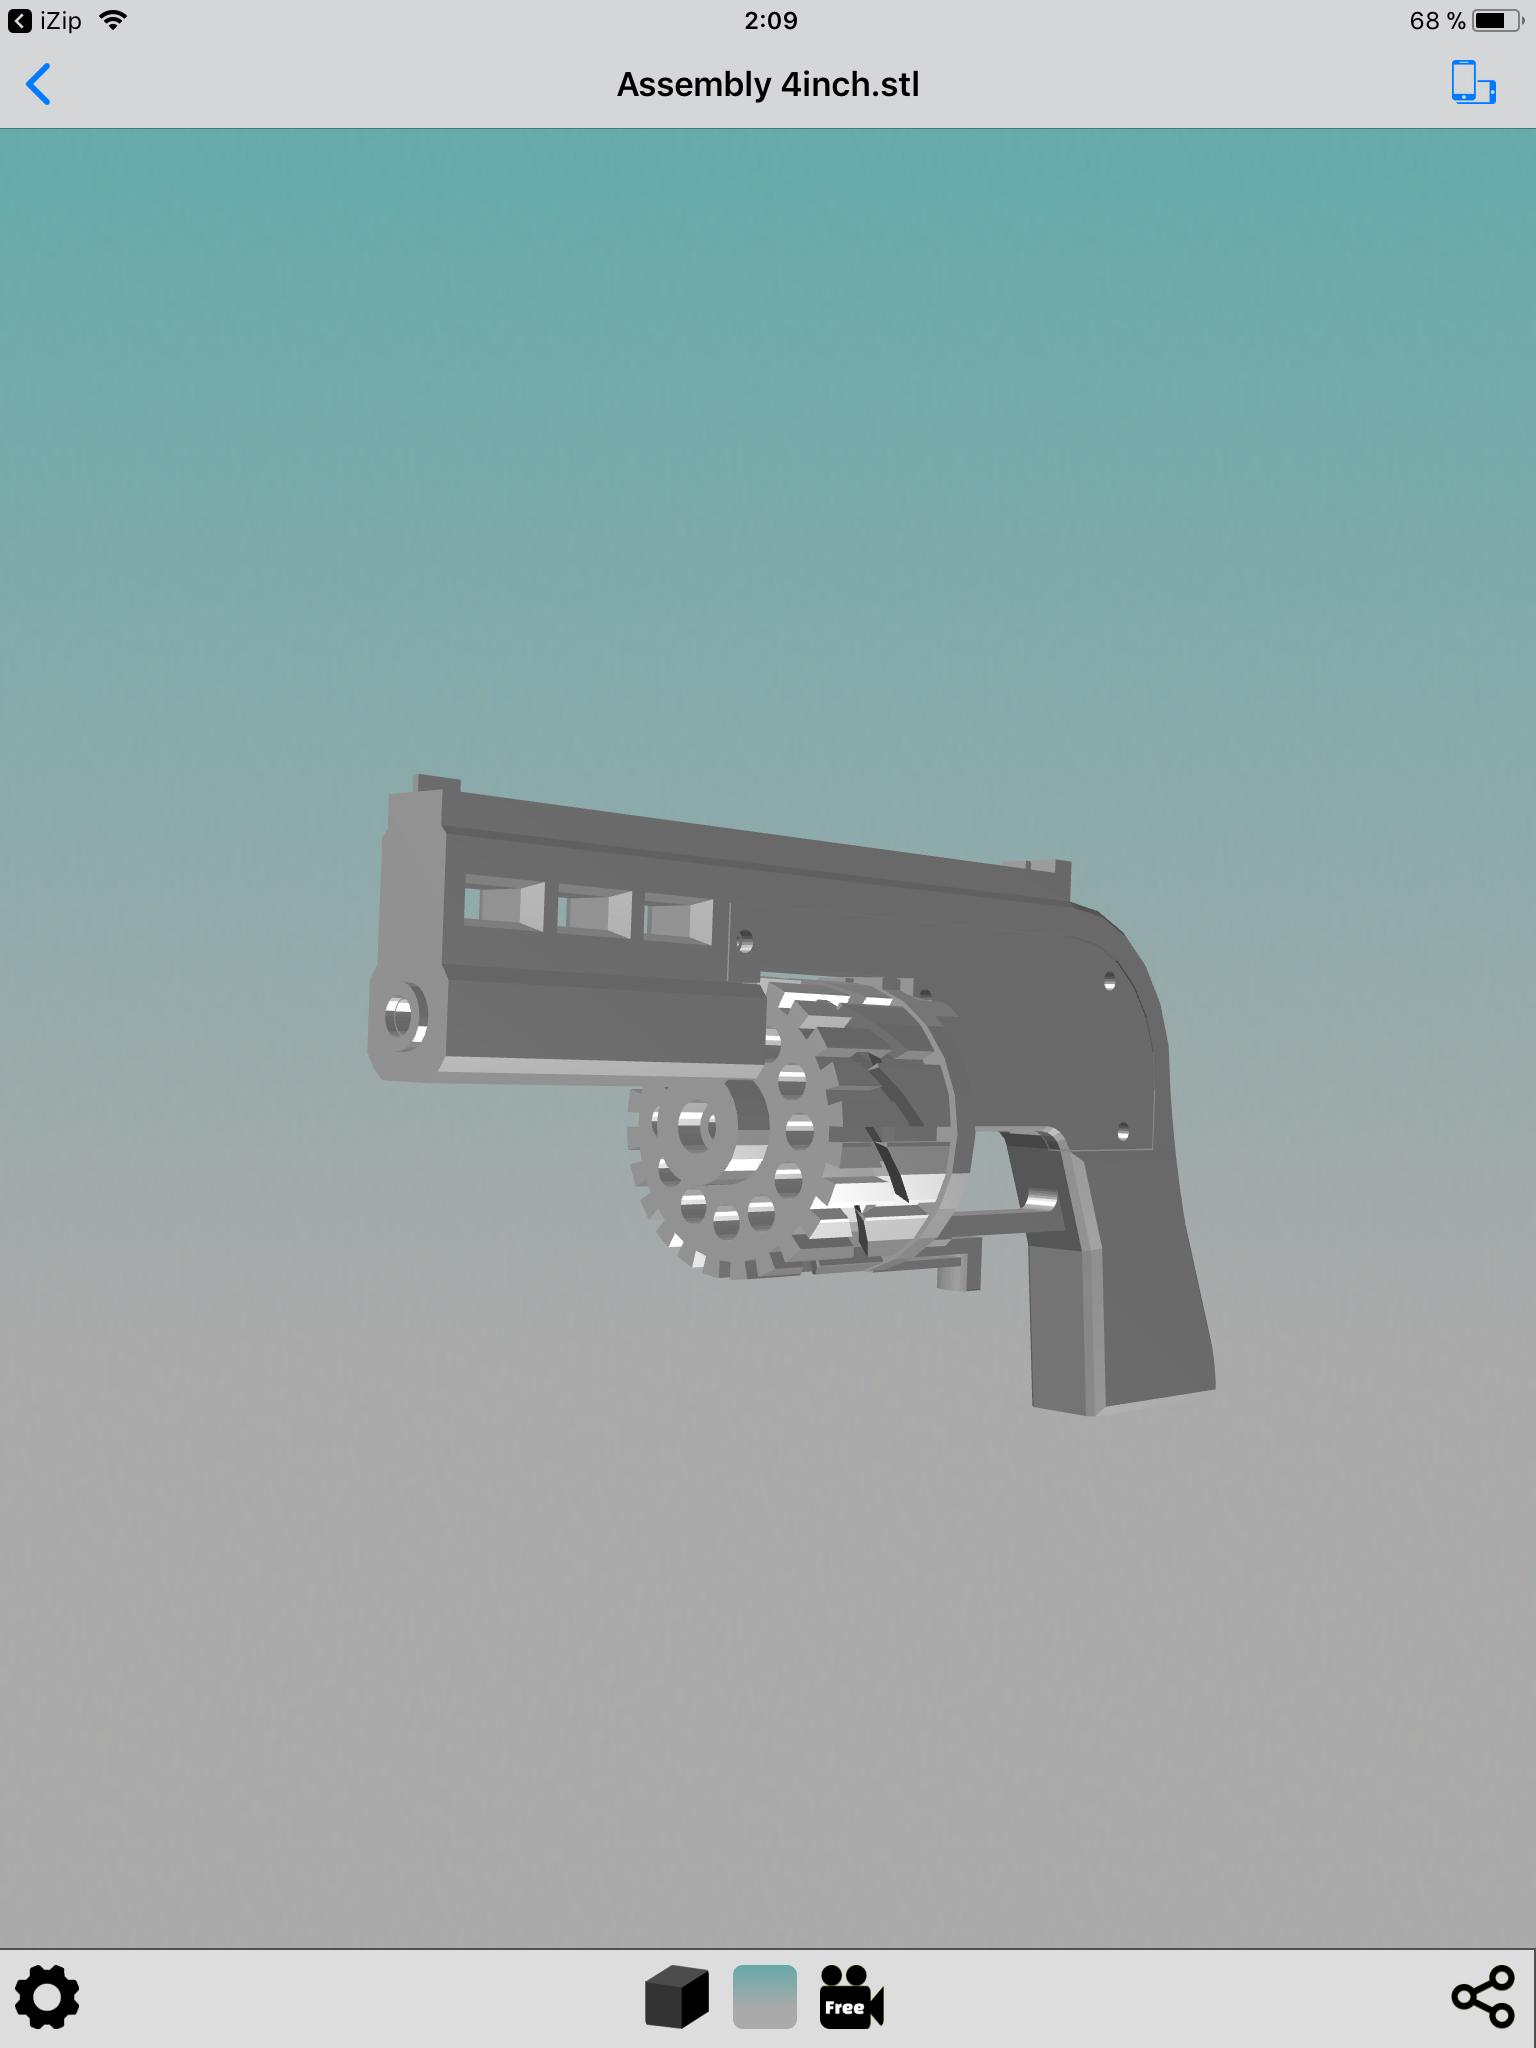 F719CBE0-FB4D-45FE-8D76-92C713E76FC8.png Download STL file Pack 2 Magnum cal.38 and 22 short and long • 3D print design, Kraken1983